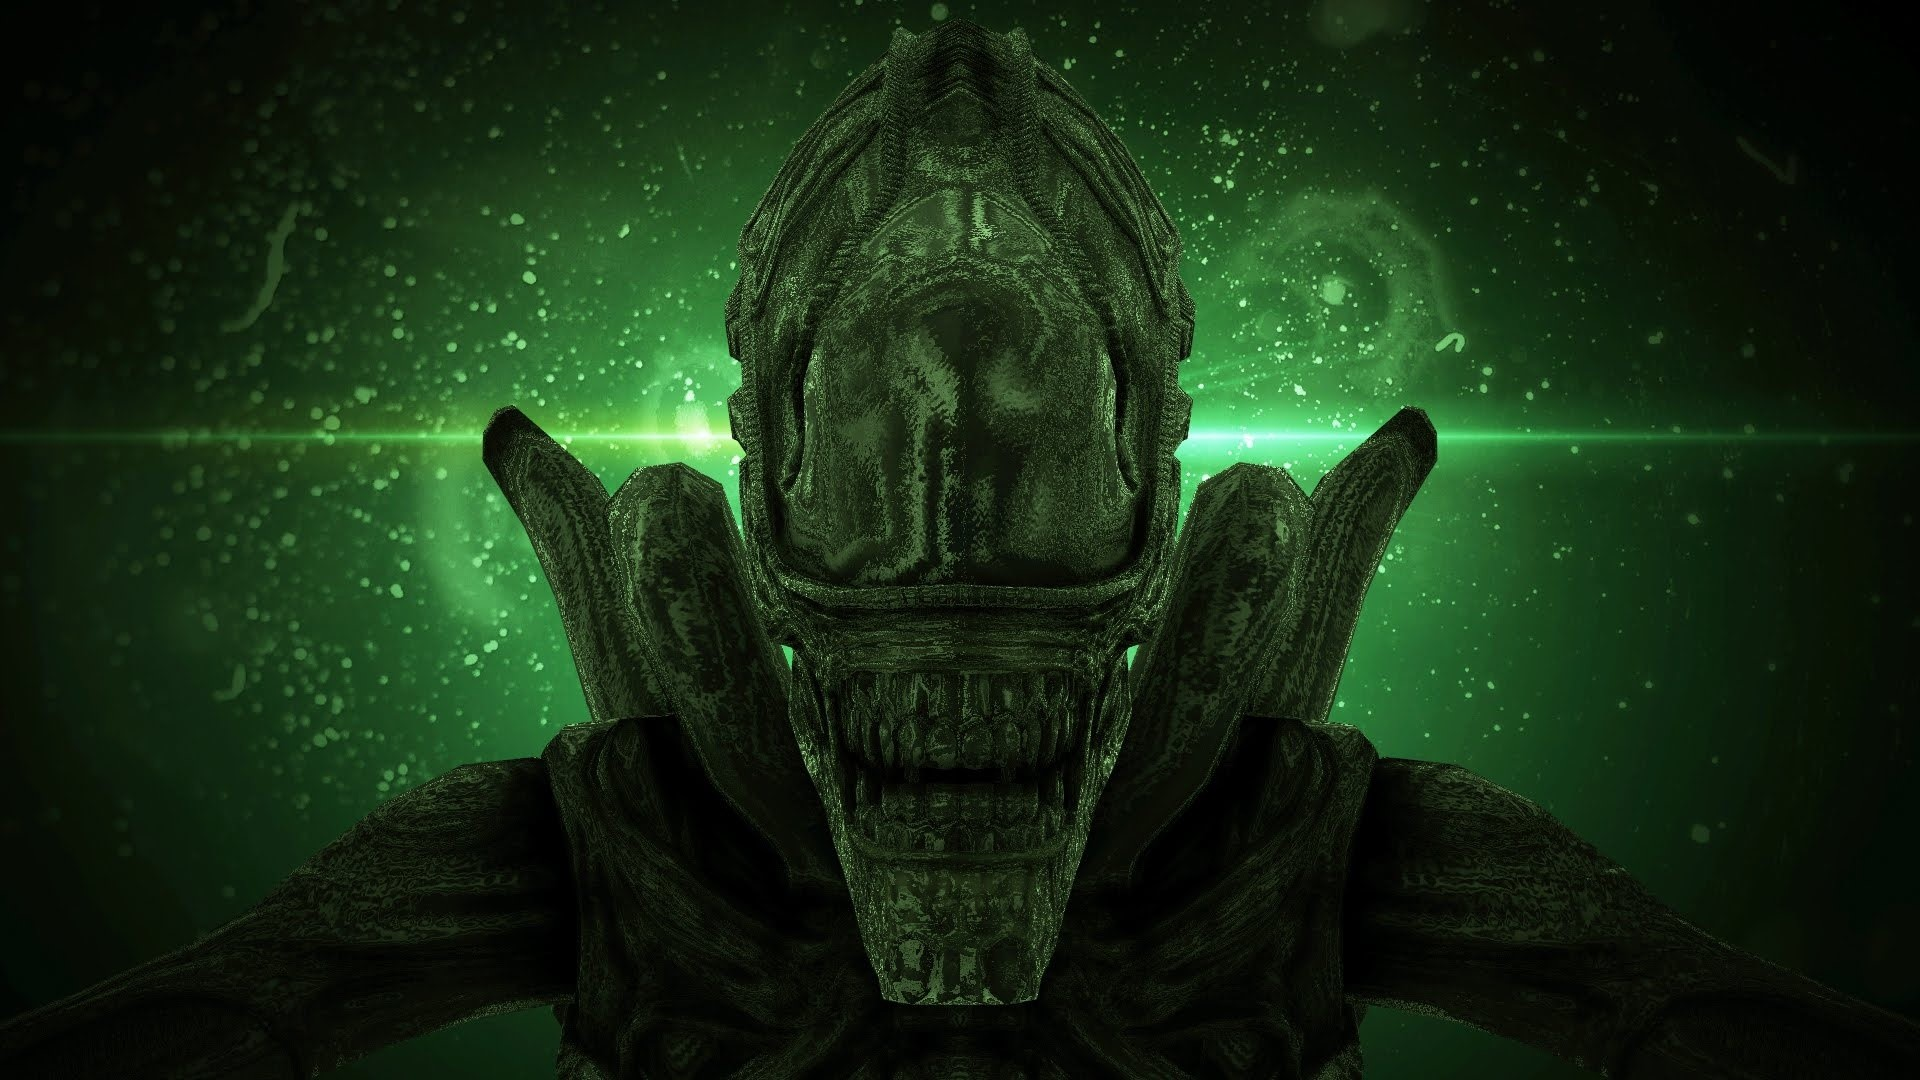 Wallpaper Alien movie Convenant